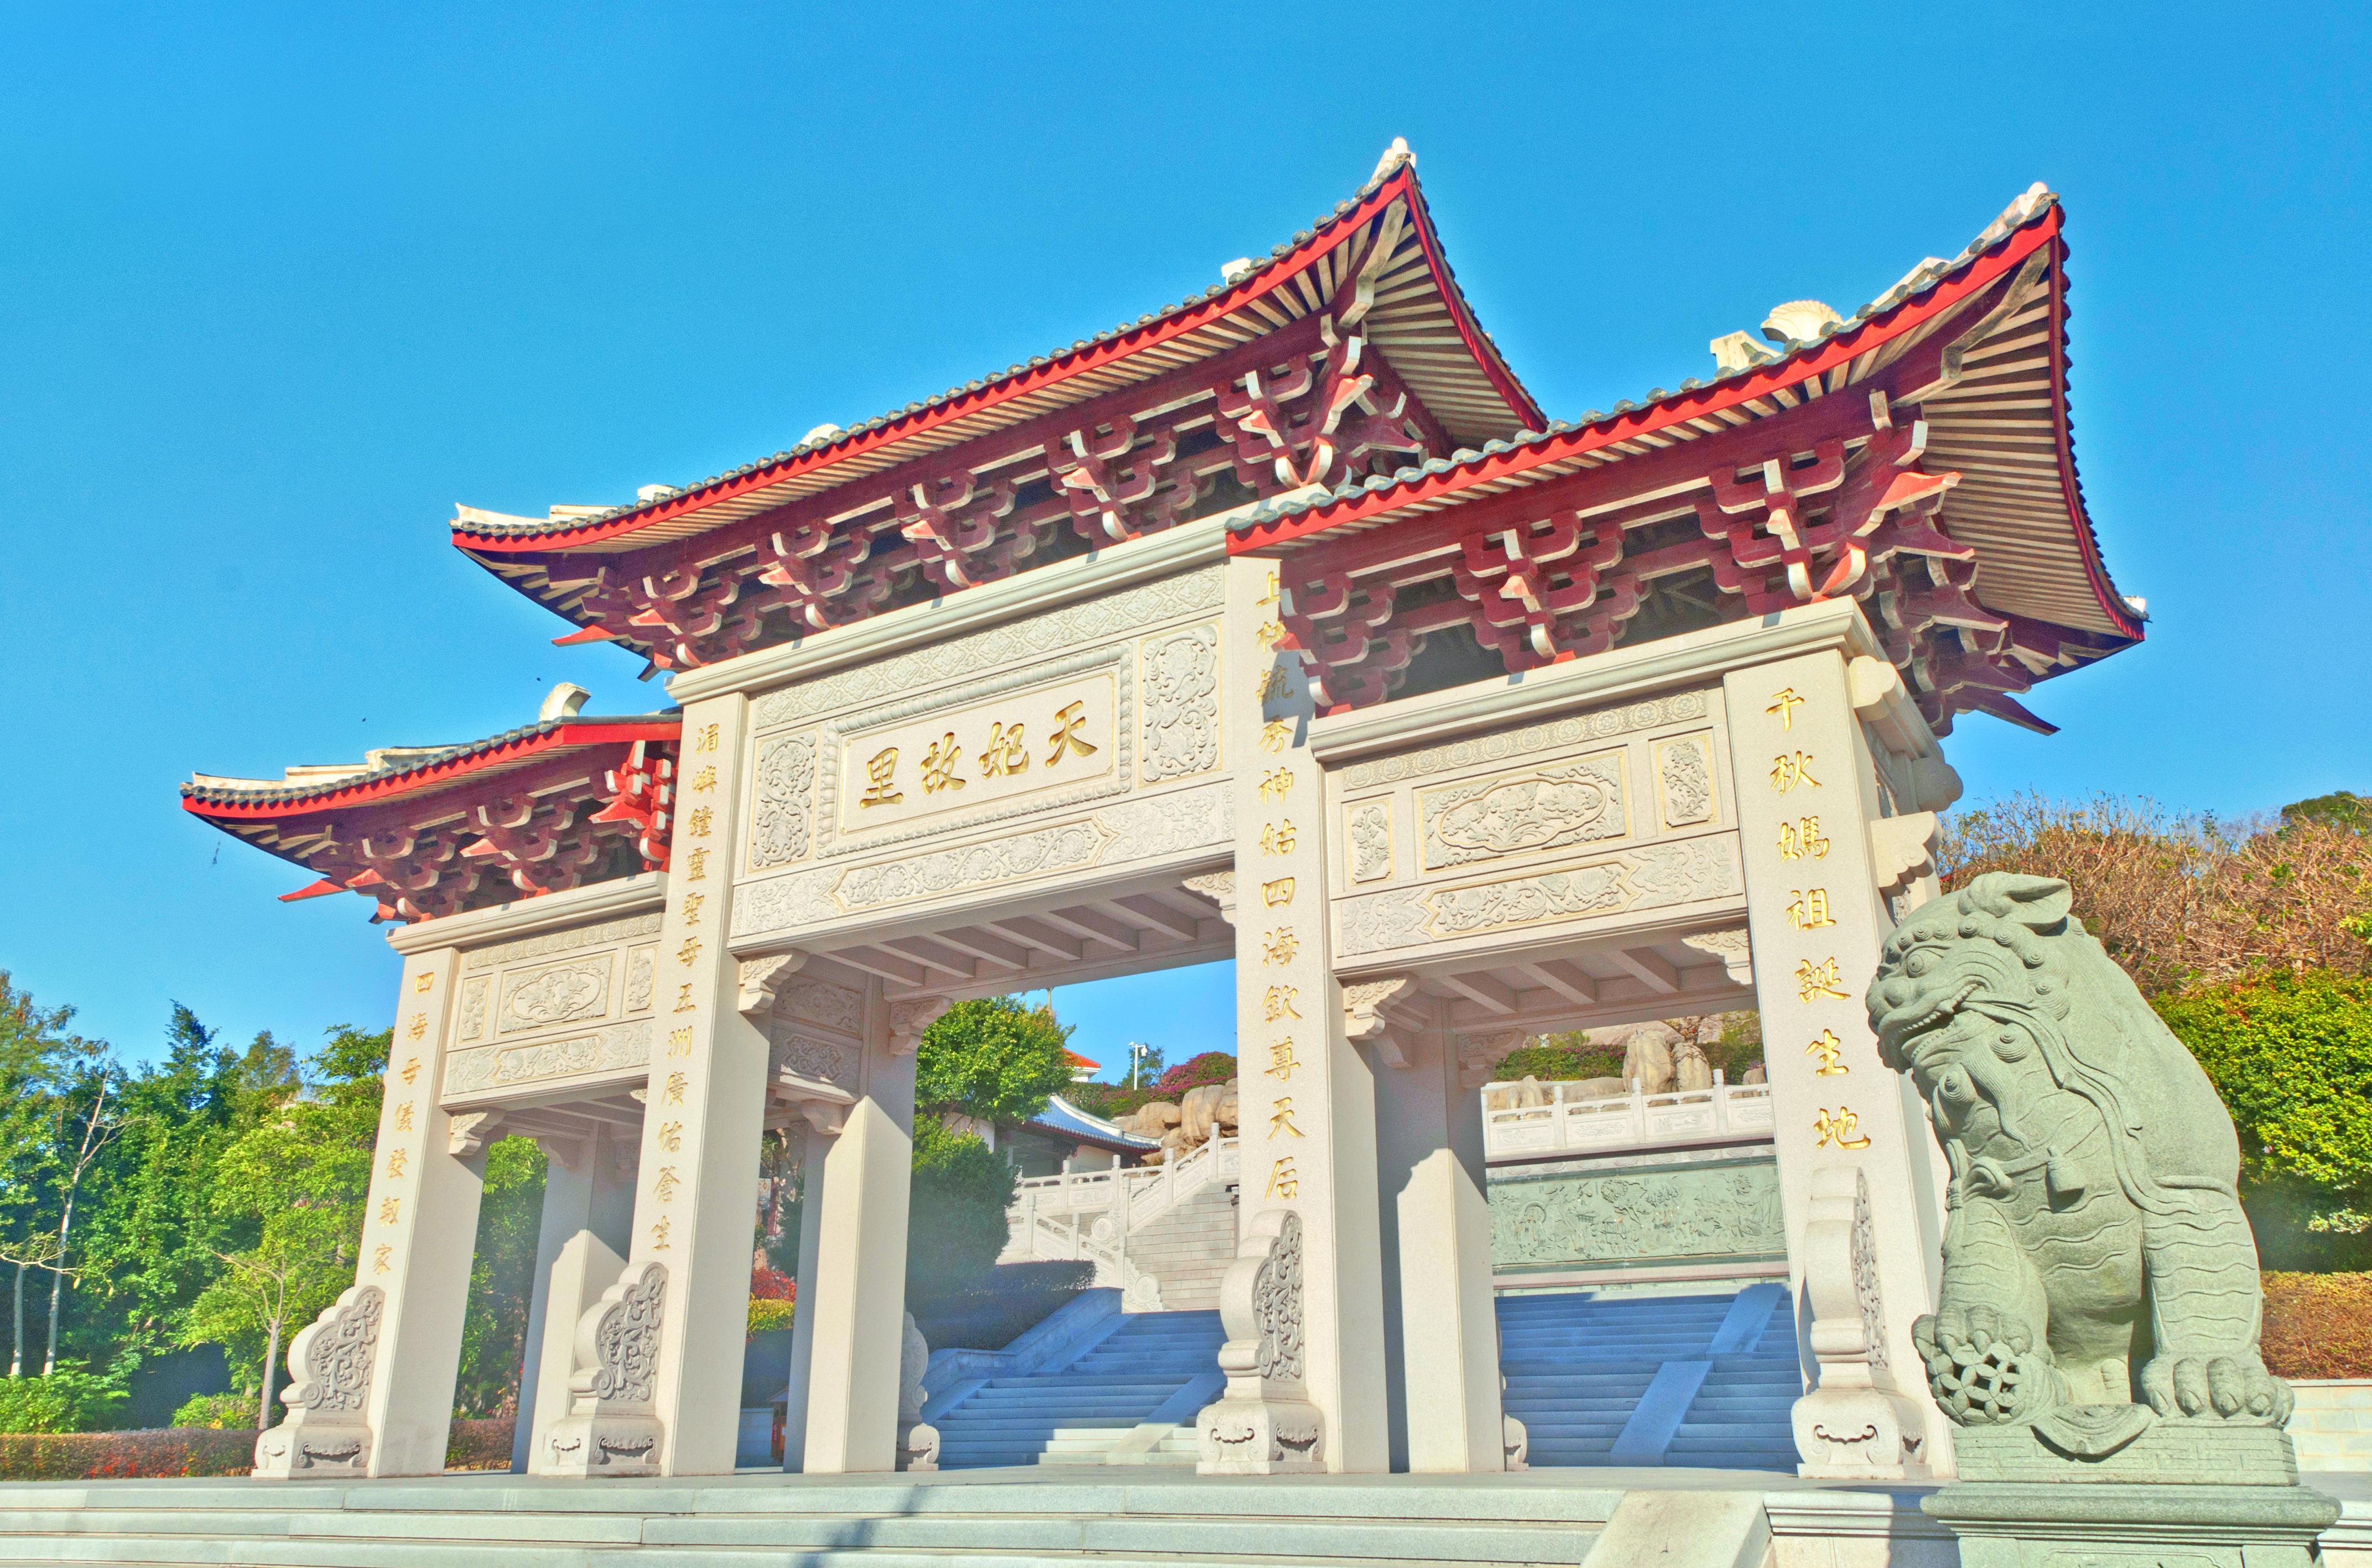 Tianfei Hometown Ruins Park